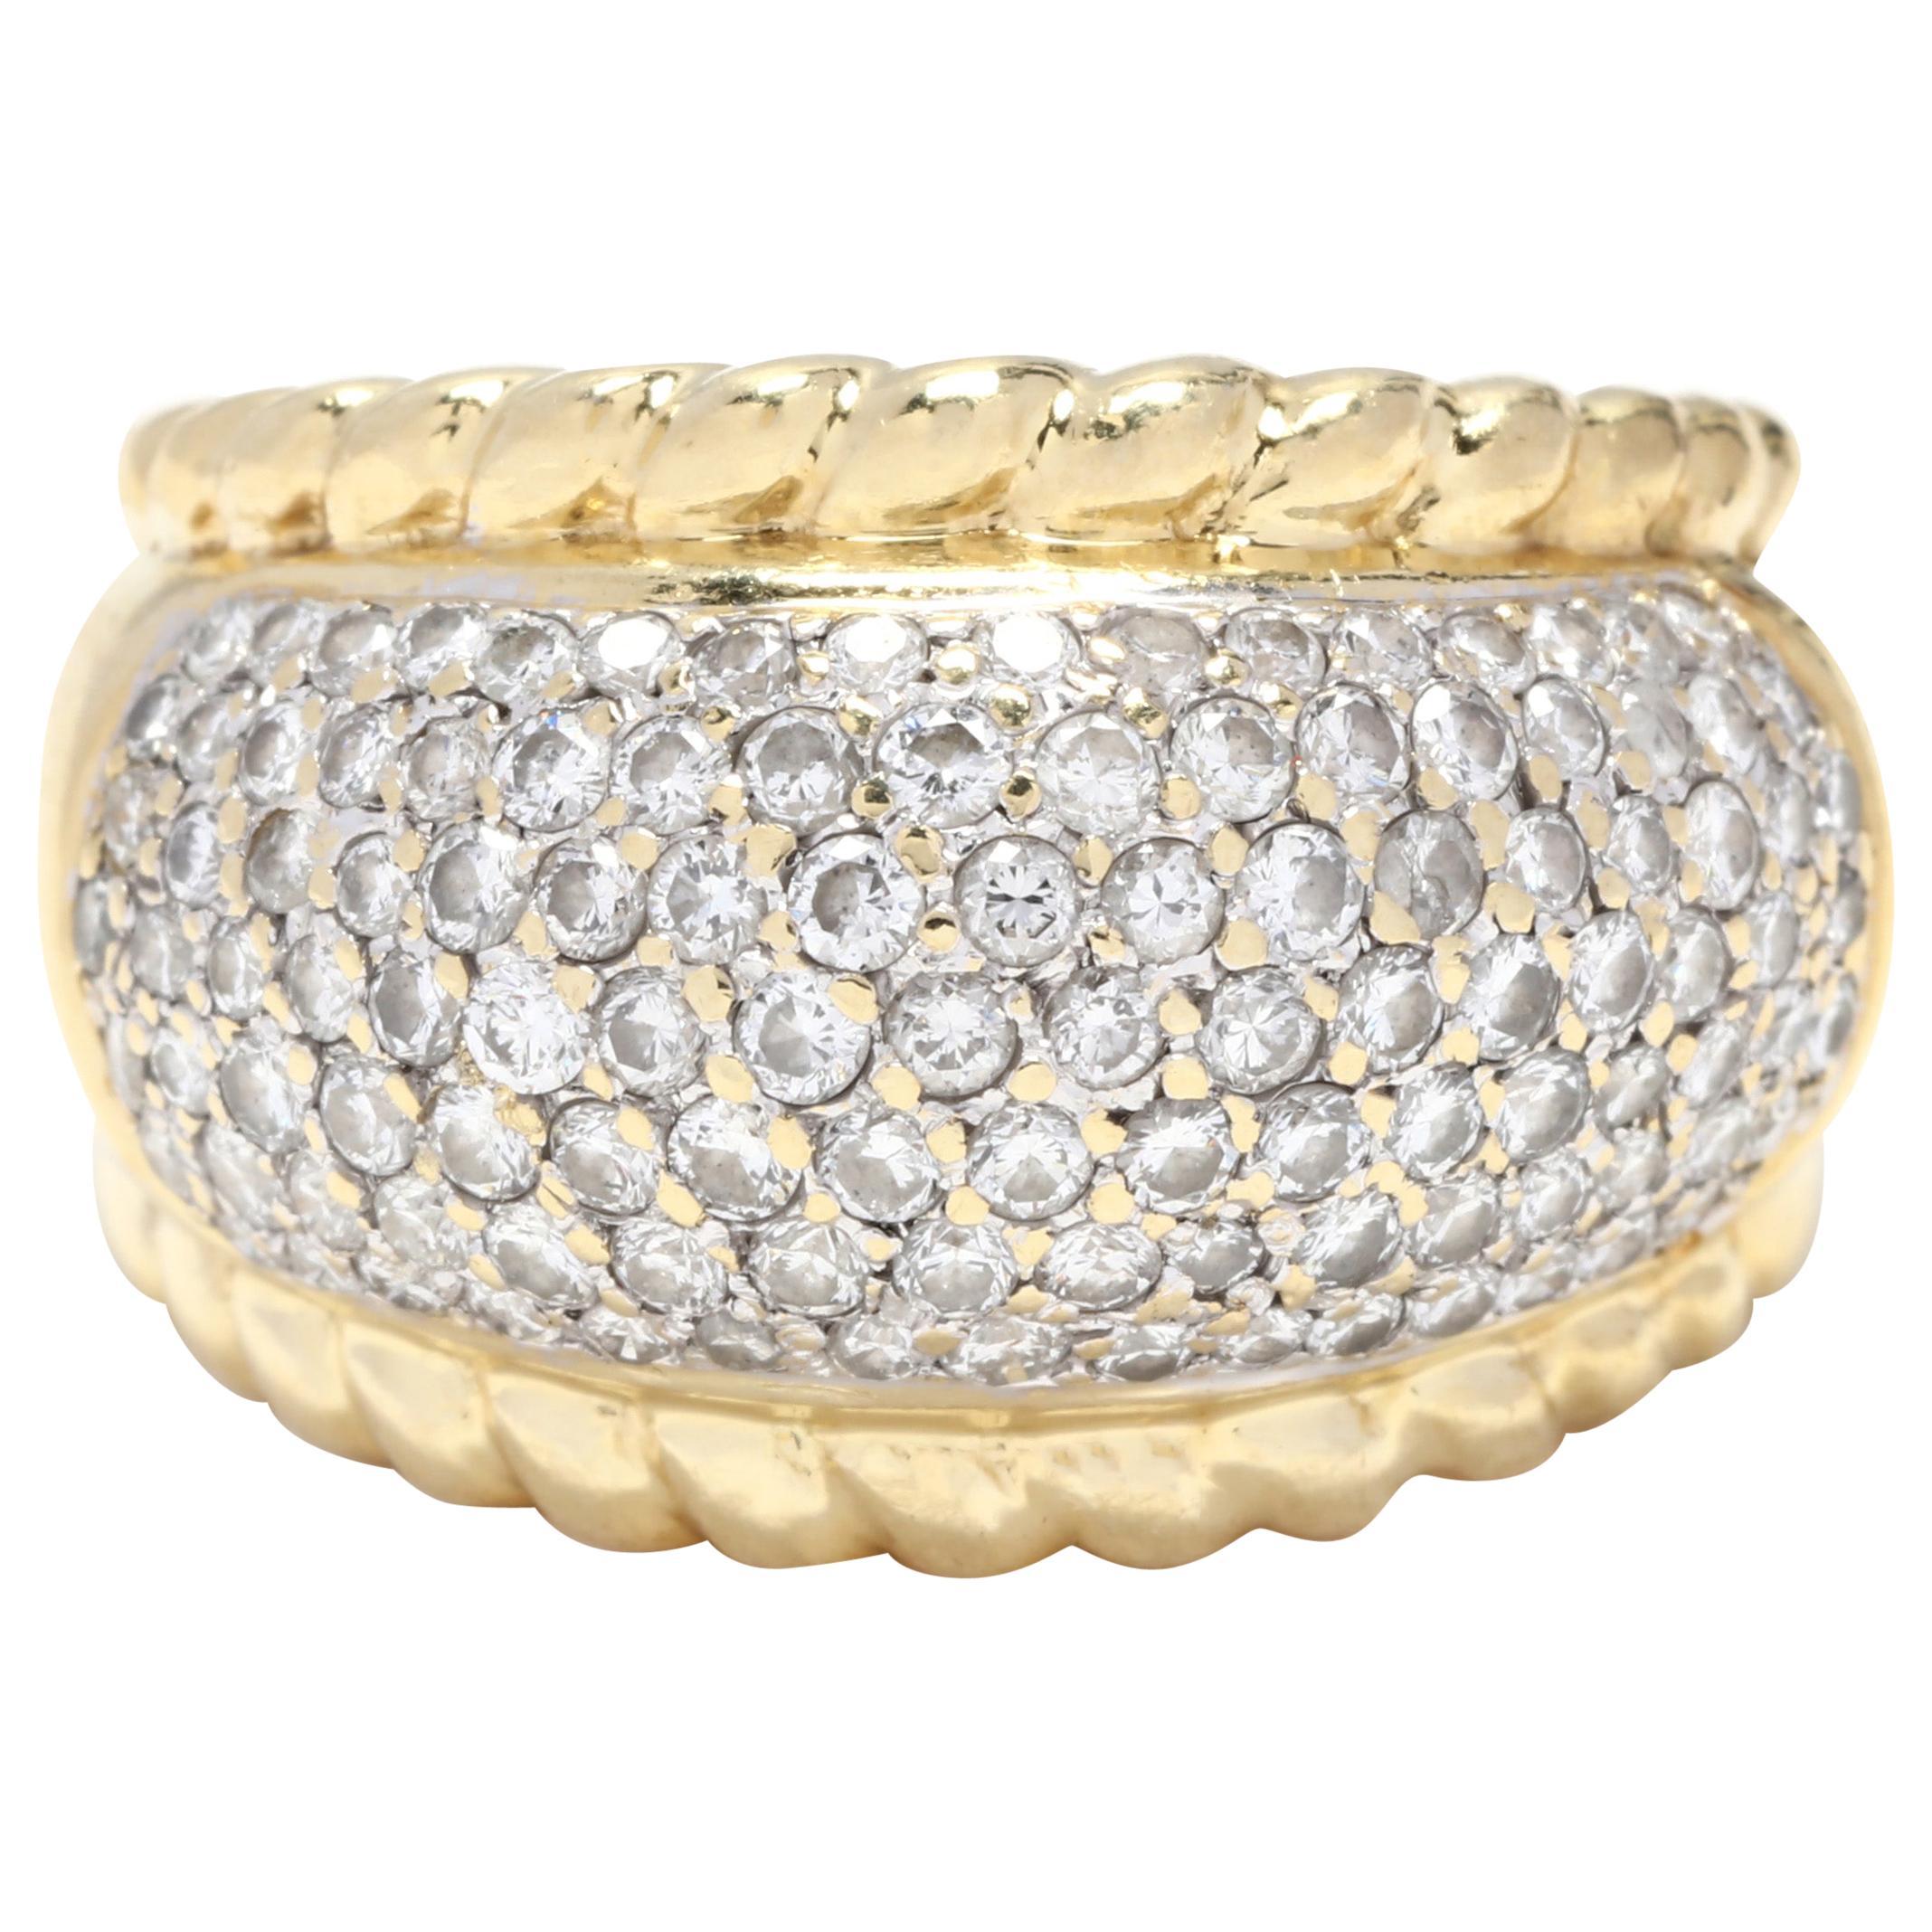 18 Karat Yellow and White Gold Diamond Dome Ring